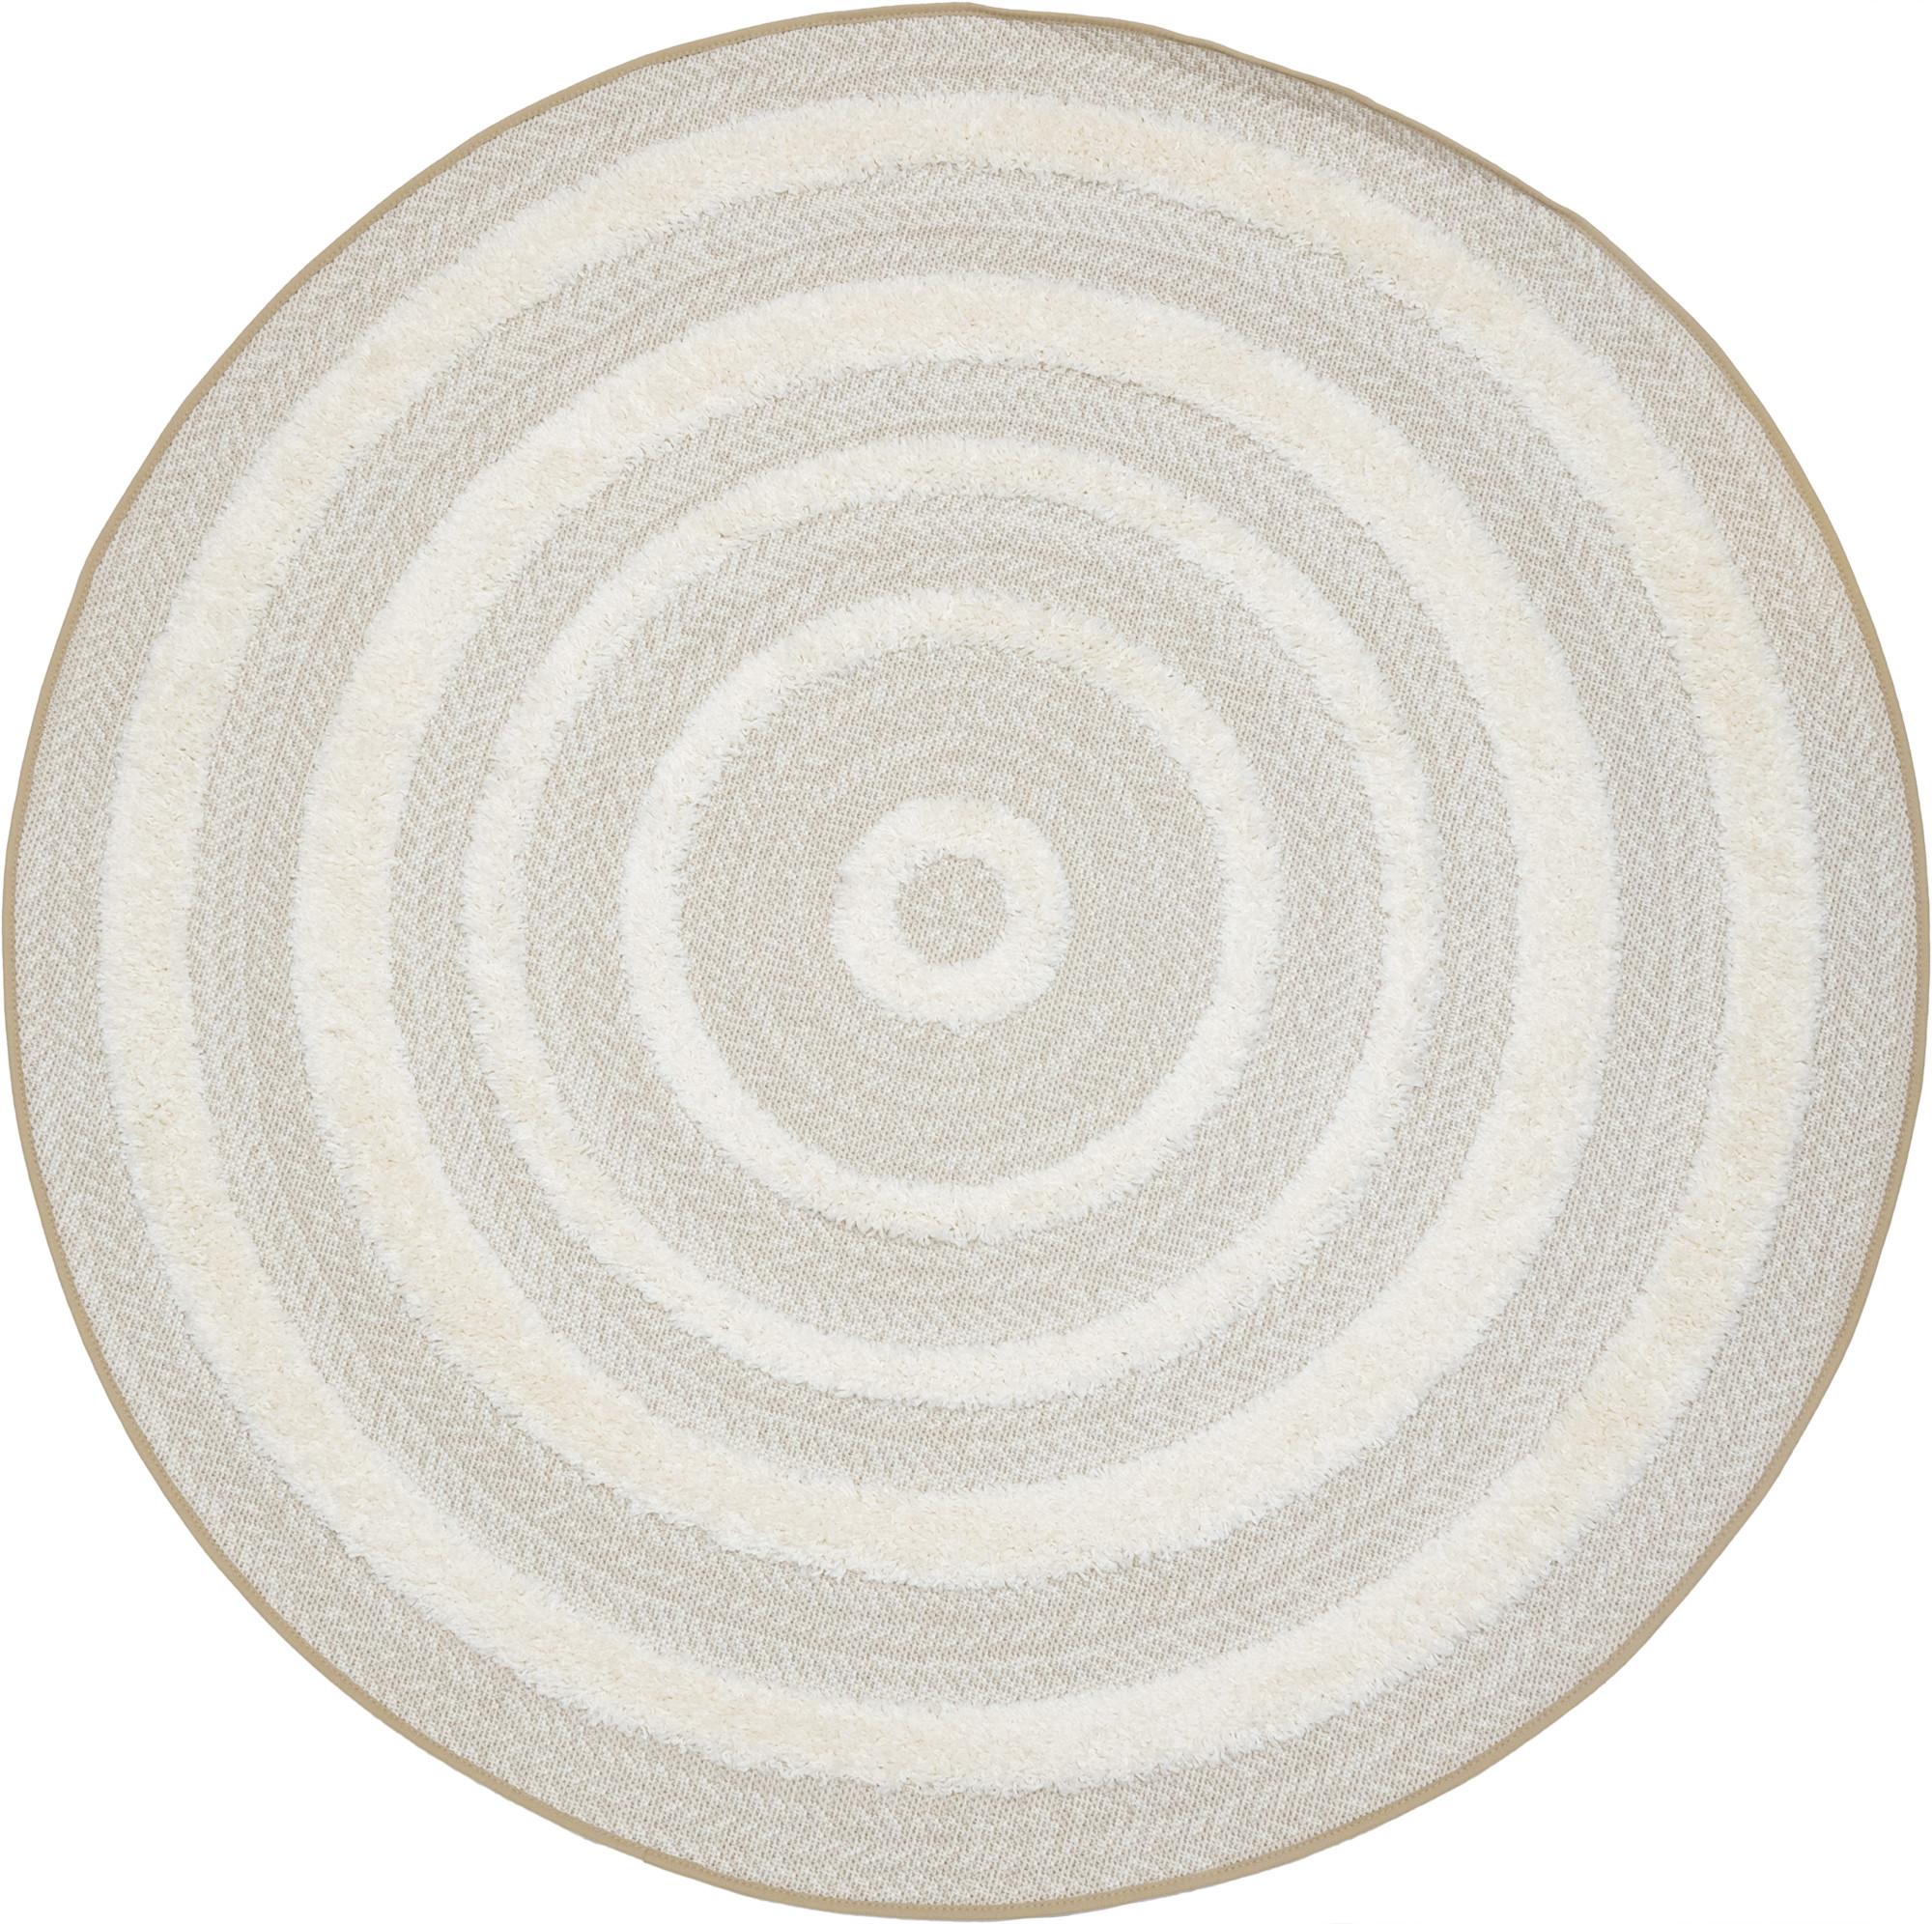 Ковер полипропилен Richie 15513/653 160x160 см круг